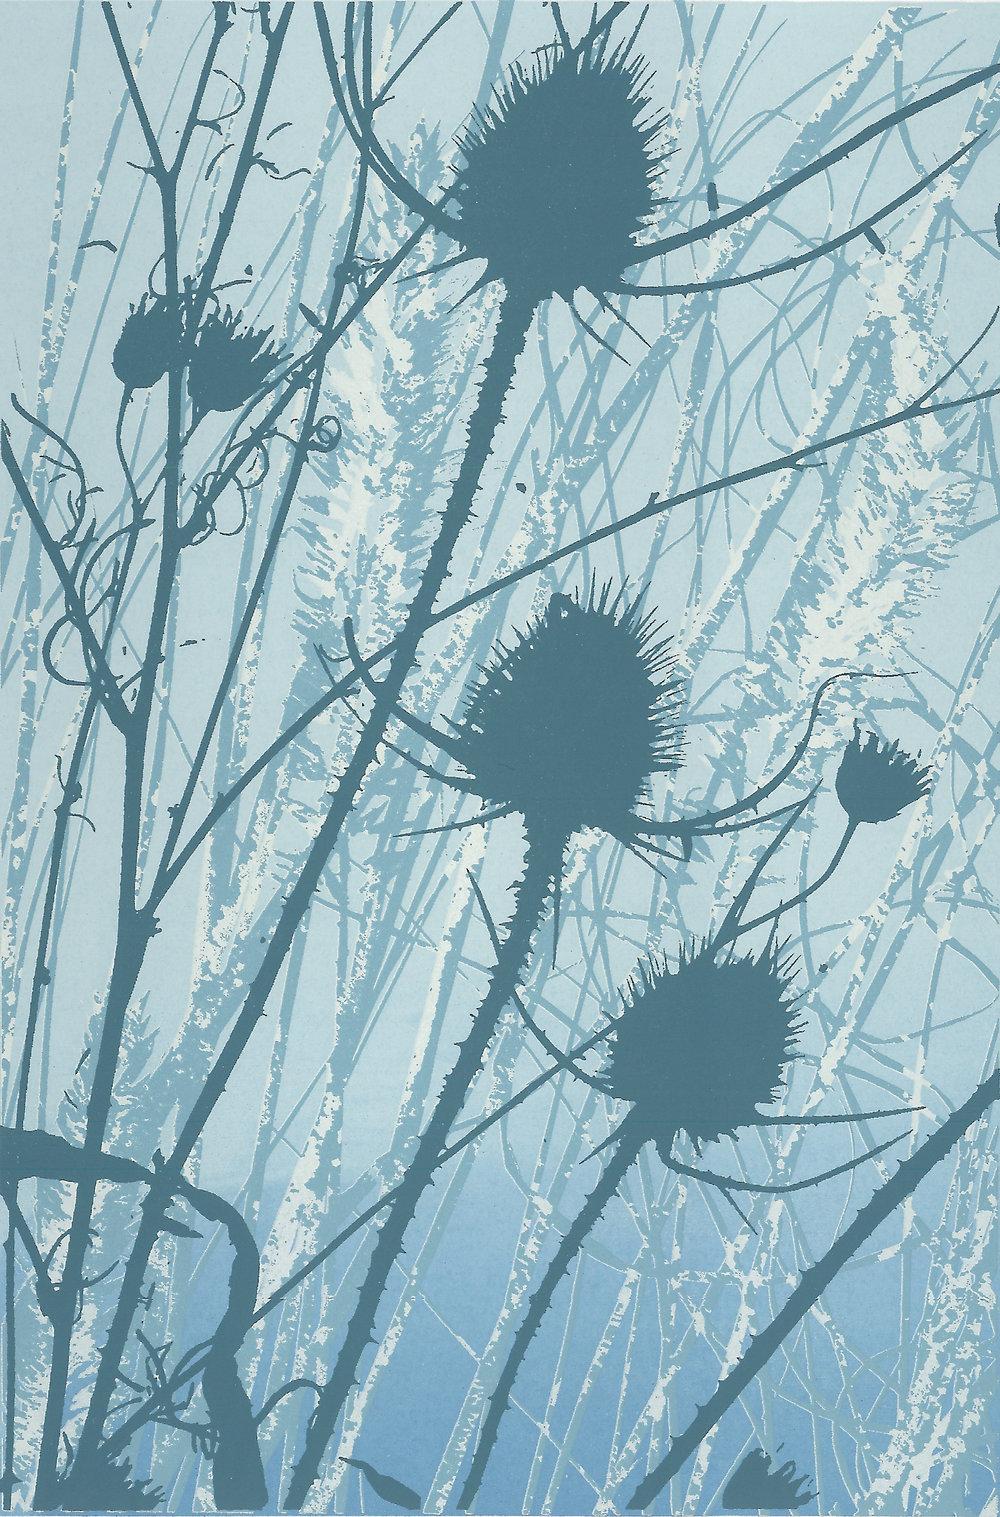 Winter Shadows 1